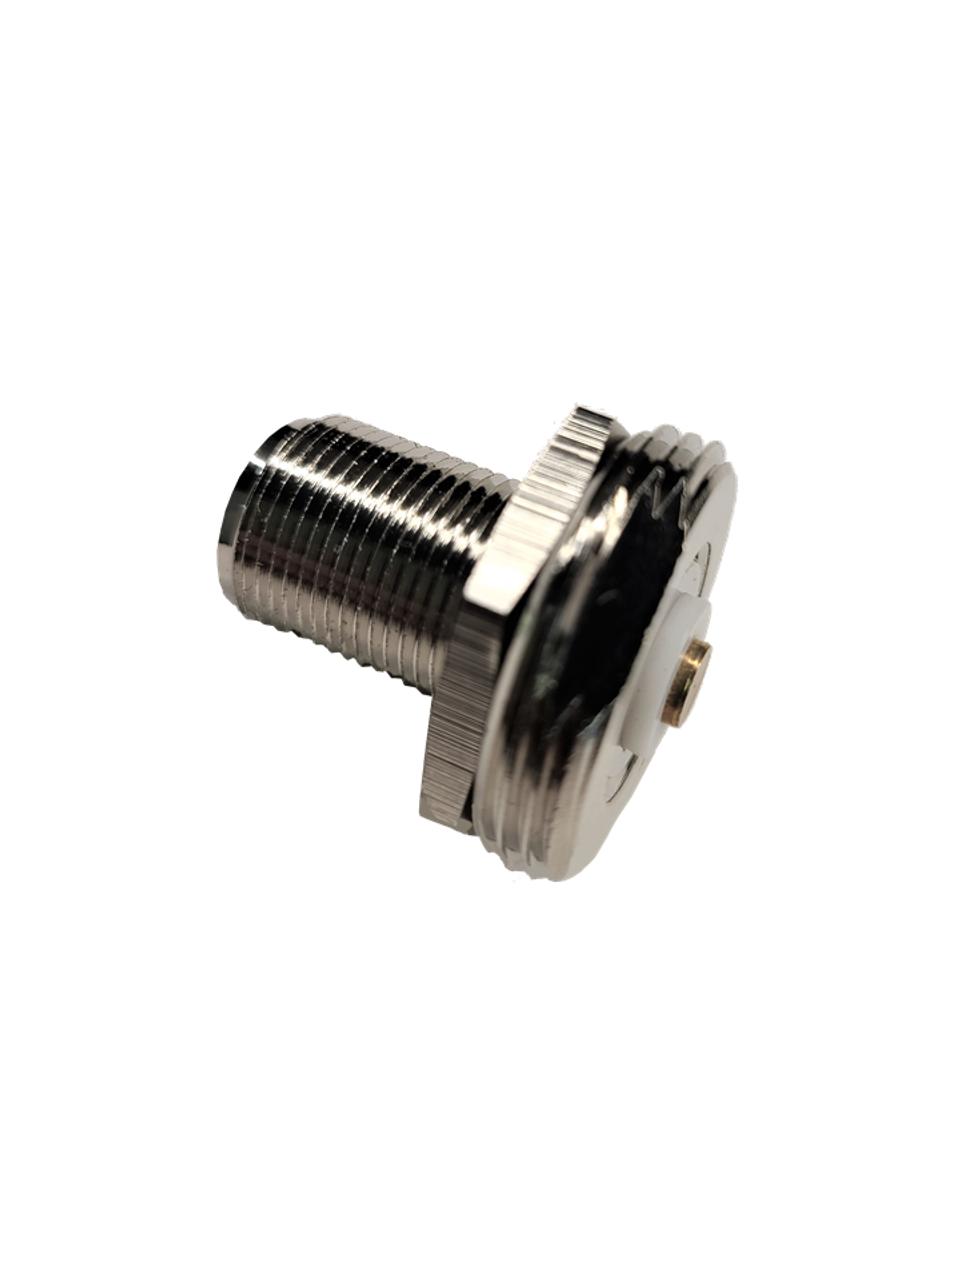 Barrel Adapter NMO Male to N Female - Bulkhead Mount - Side Profile